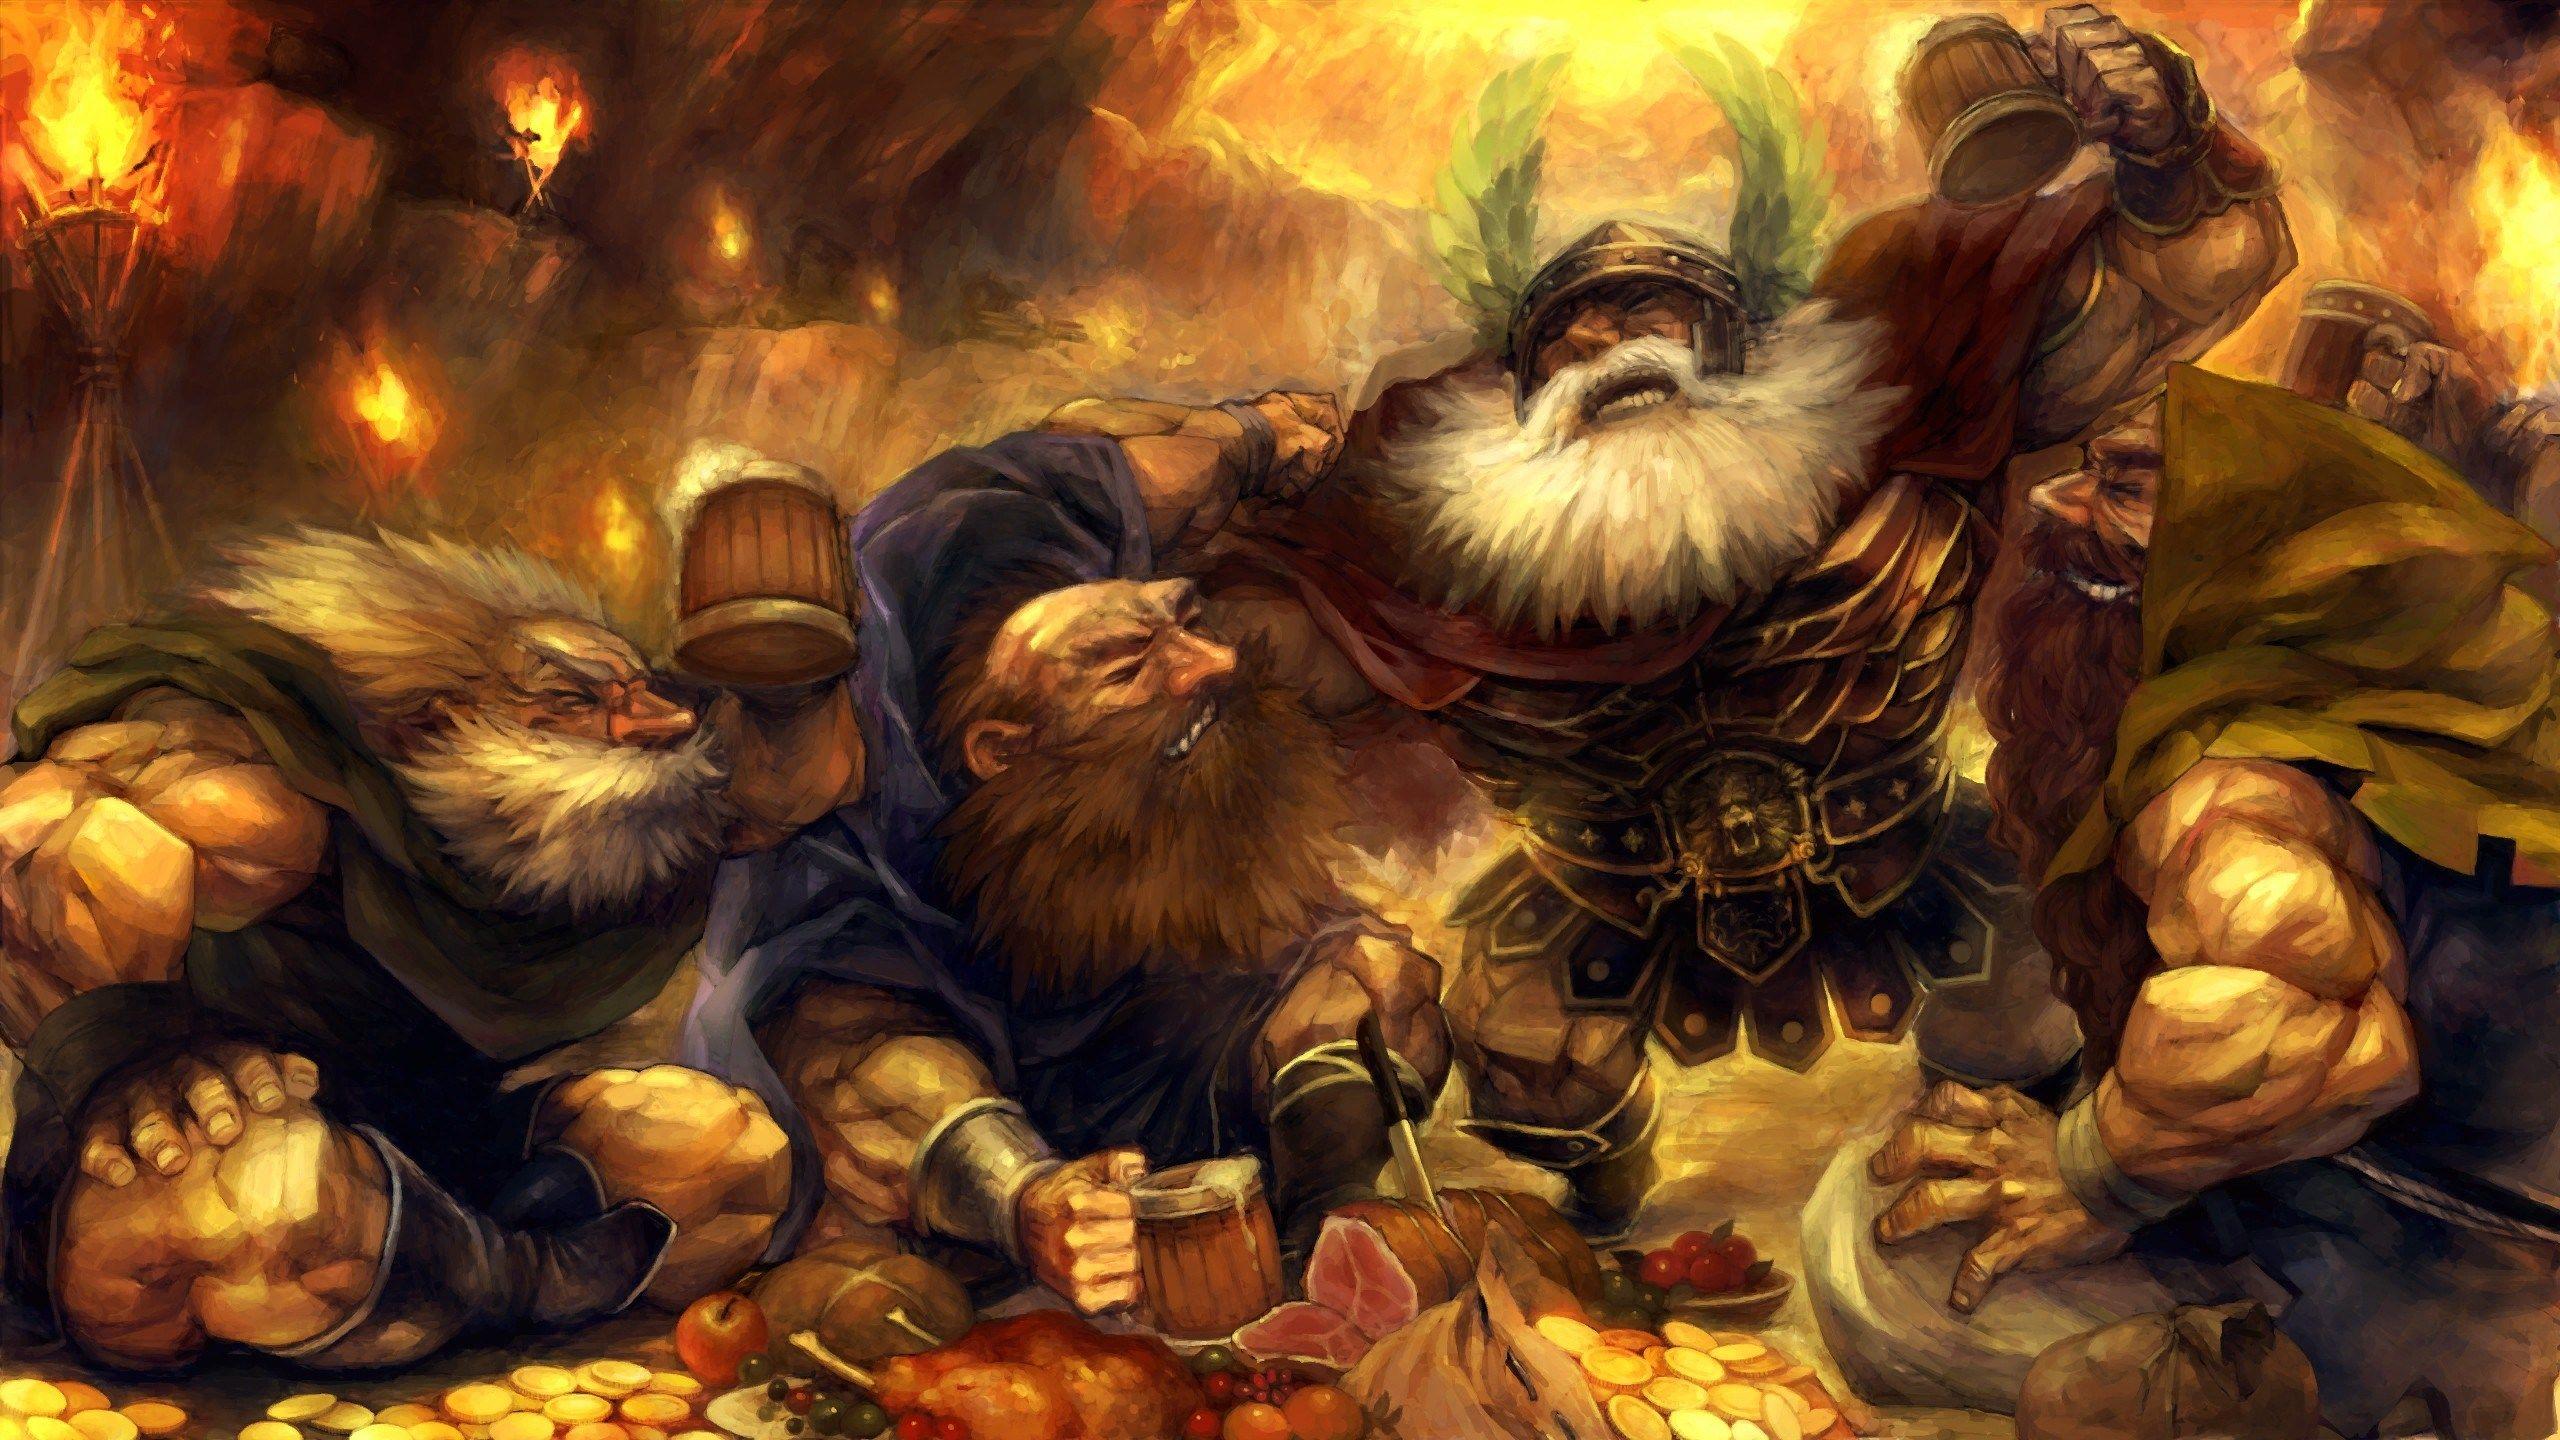 2560x1440 Dragons Crown Game Wallpaper In 2019 Dragons